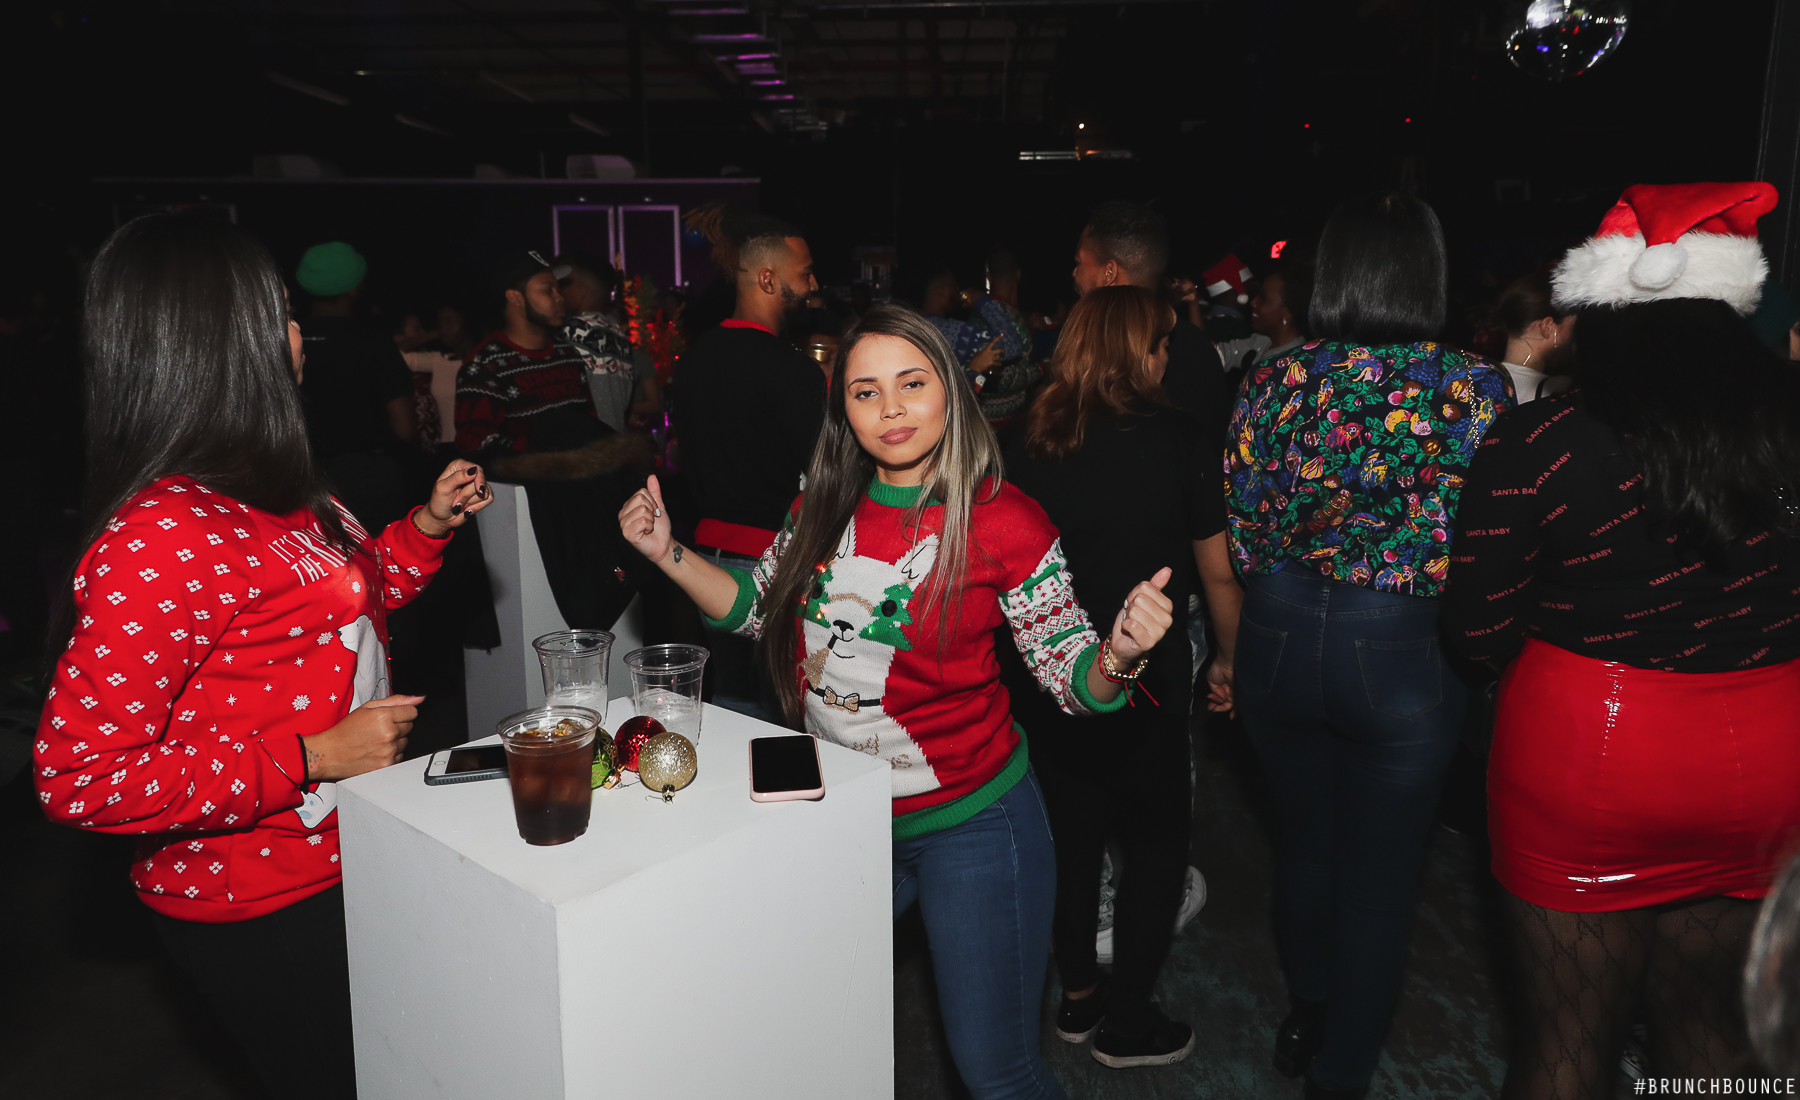 Brunch Bounce Ugly Sweater 2018-92.jpg